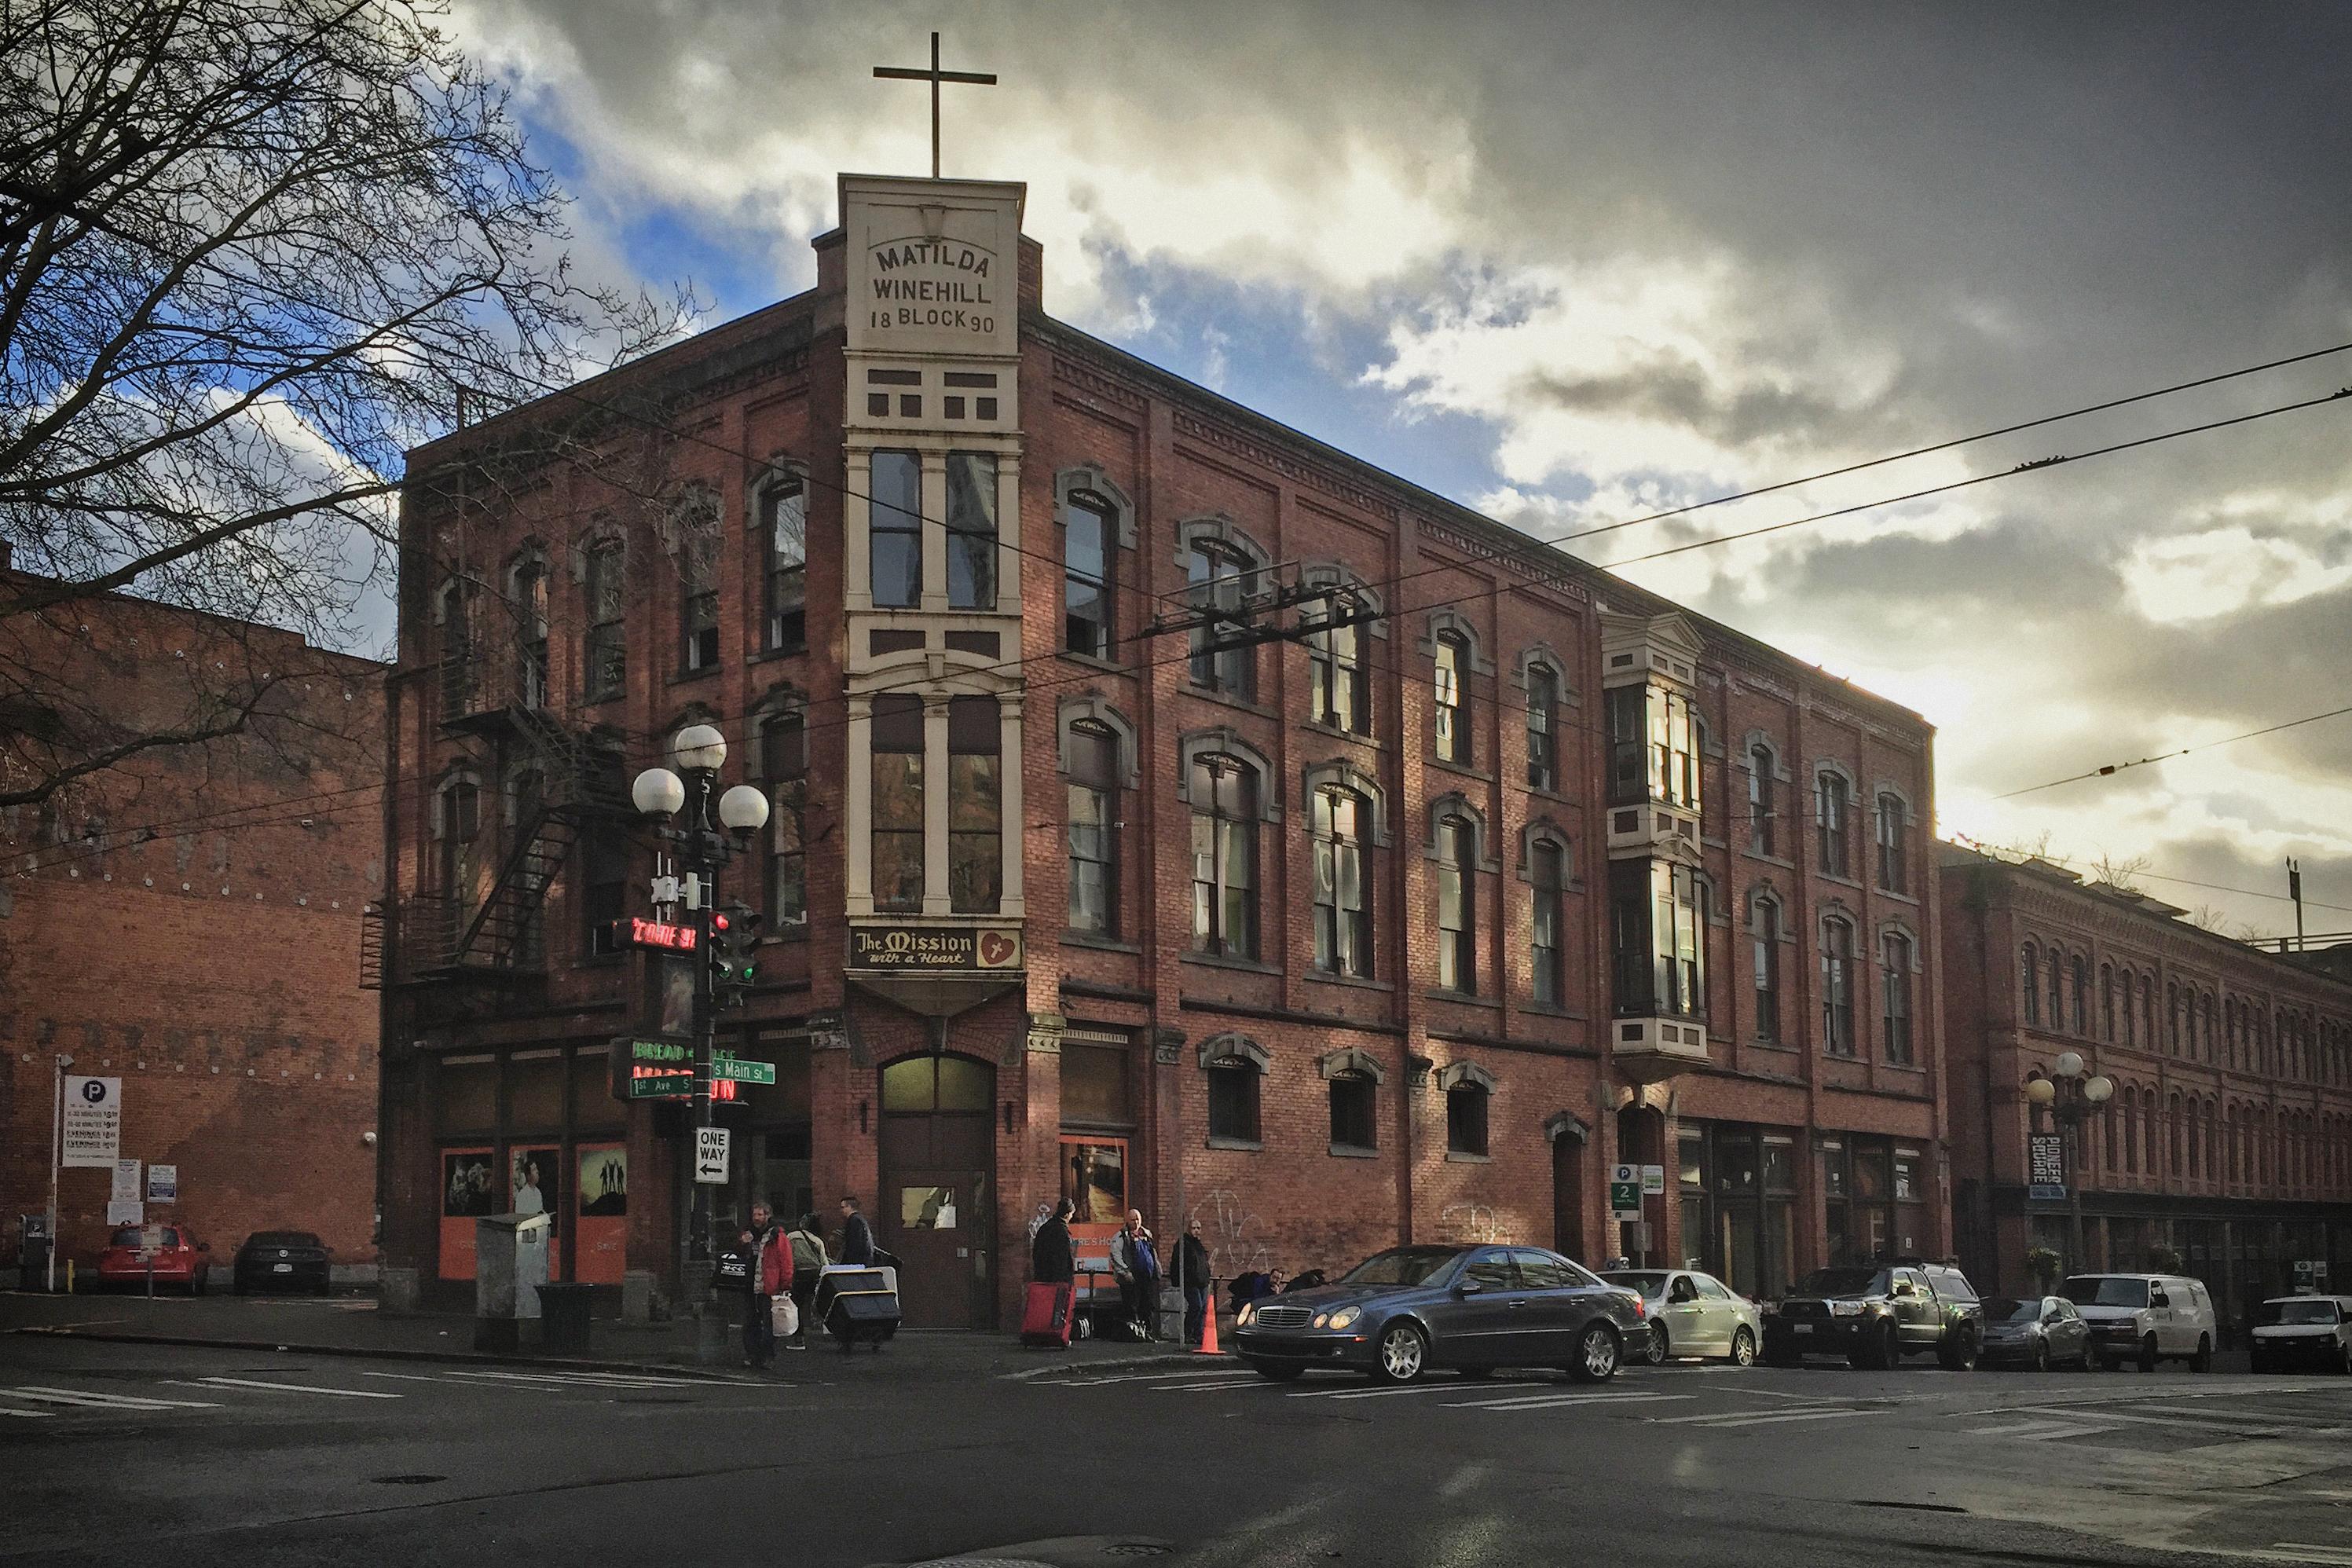 Seattle — Matilda Winehill Block.jpg